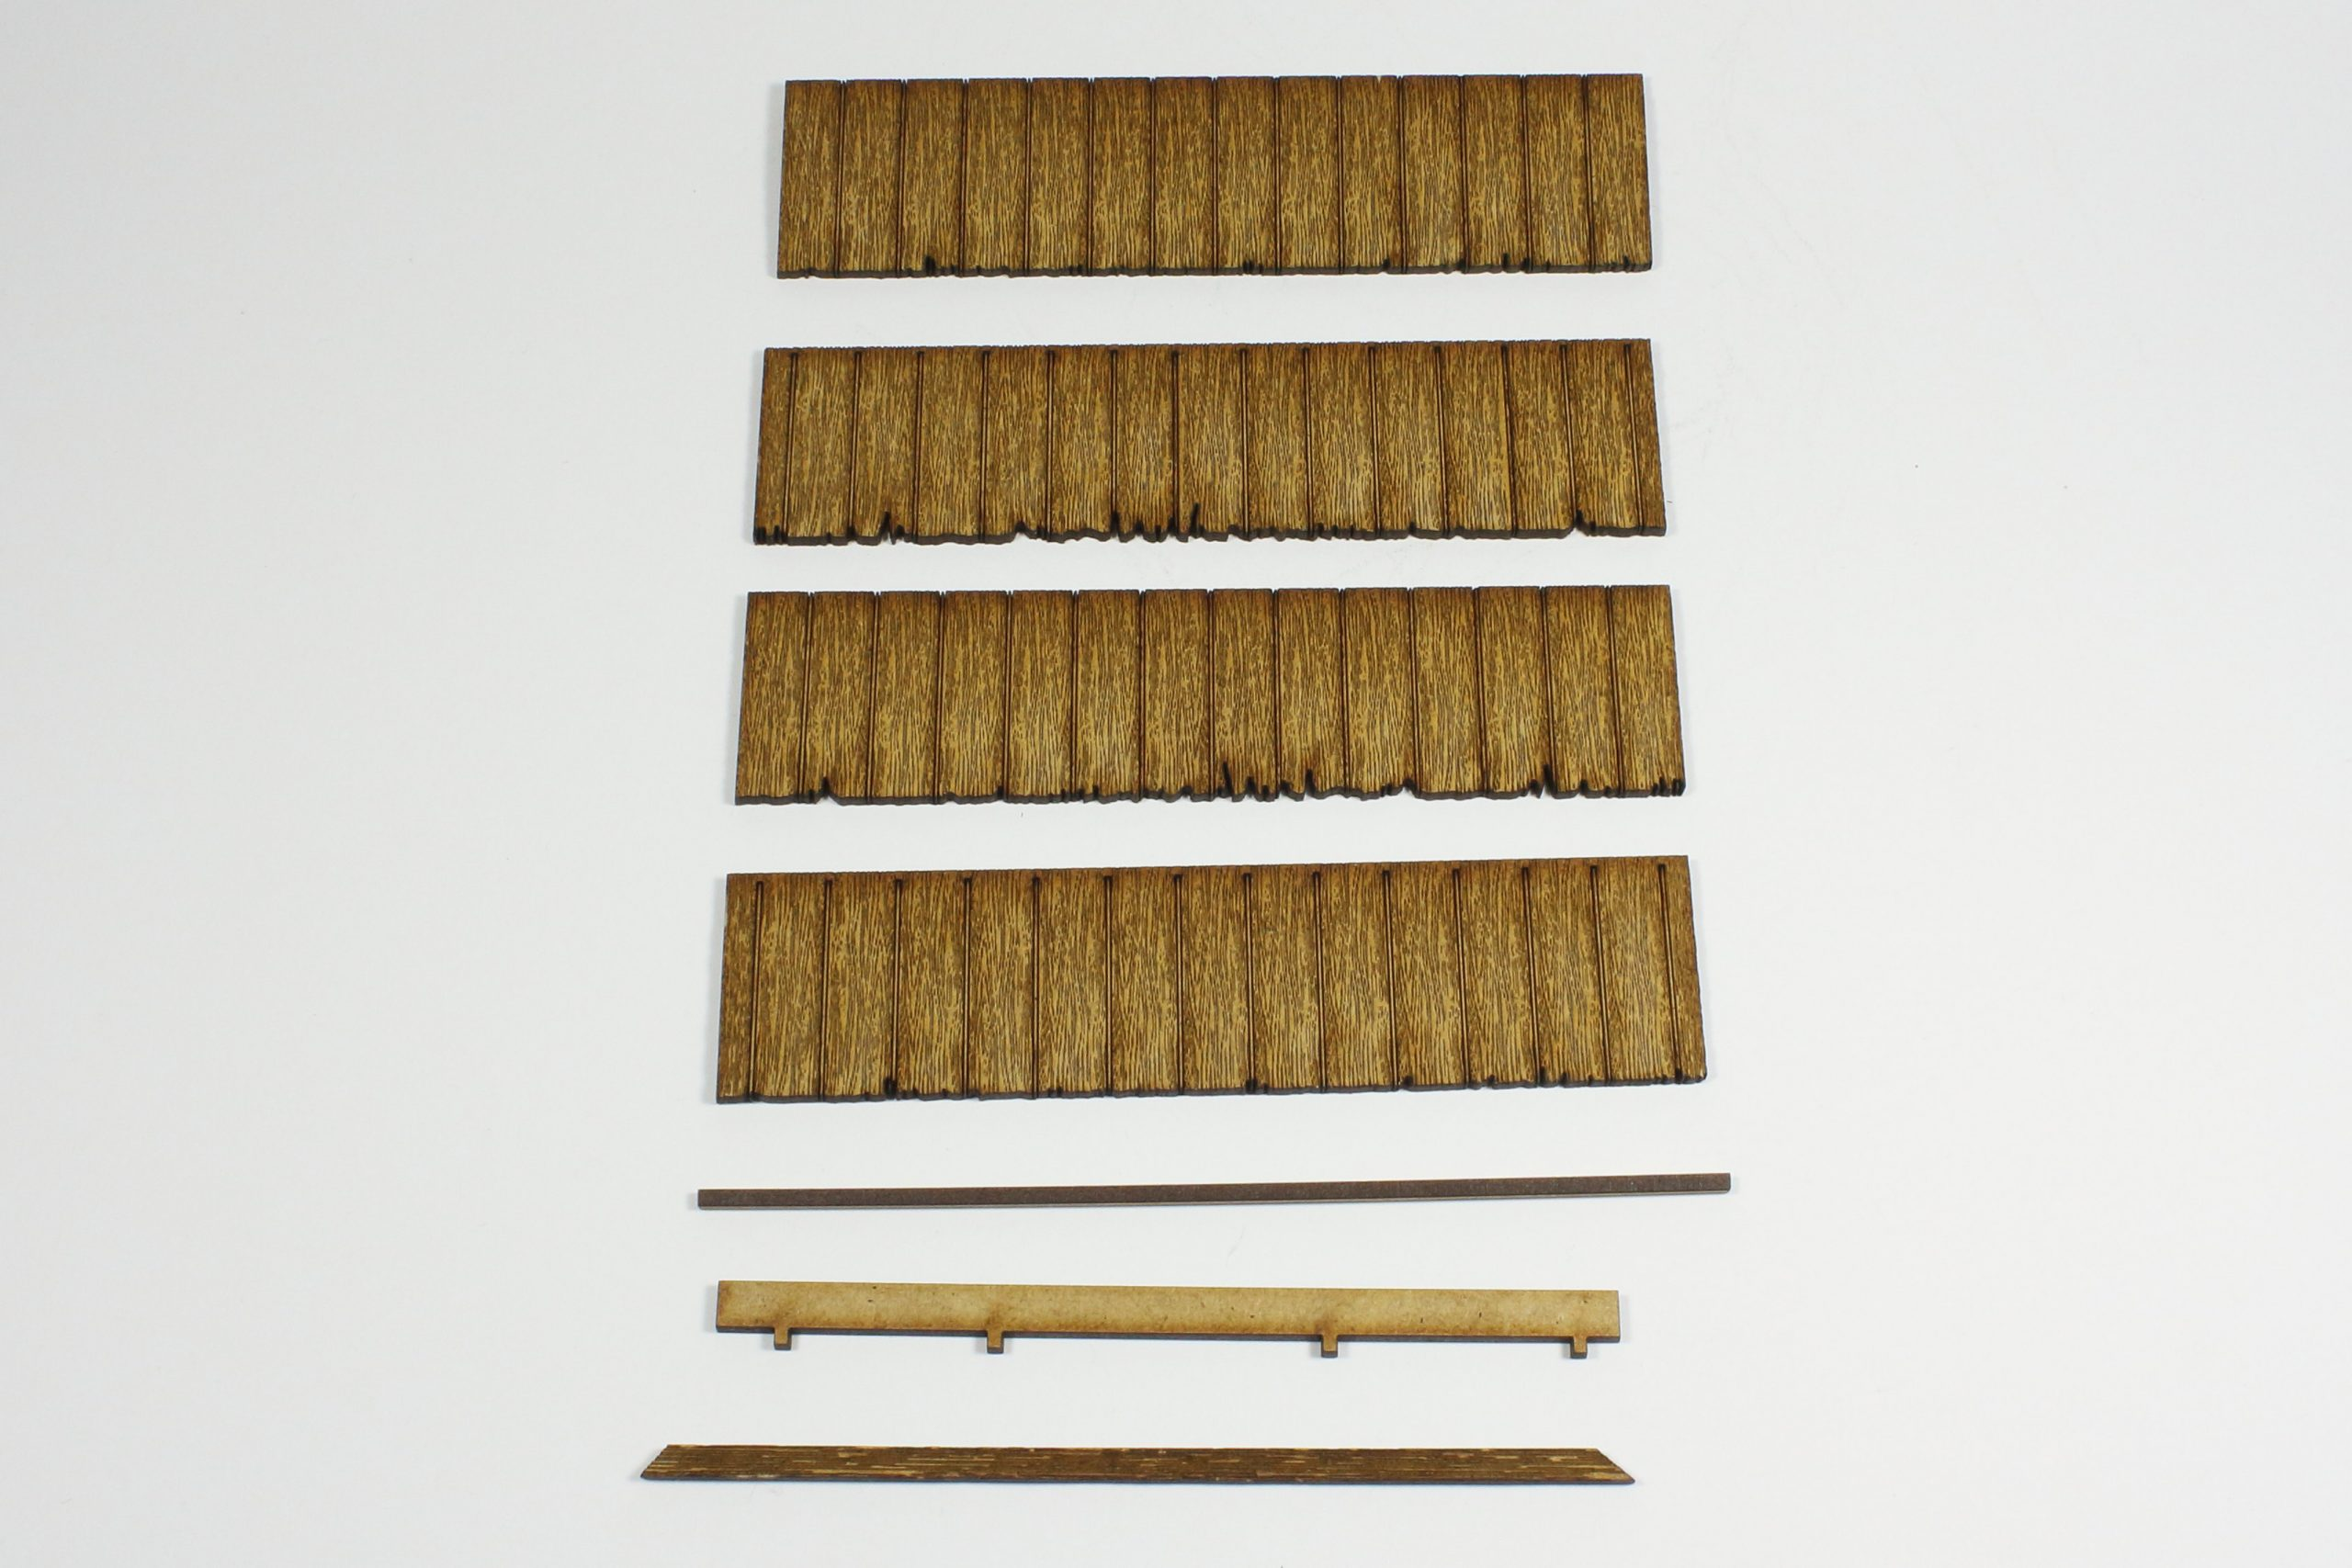 Bild-8-scaled Fachwerkhaus mit Holzschuppen - Lasercut Modellbaushop 1:35